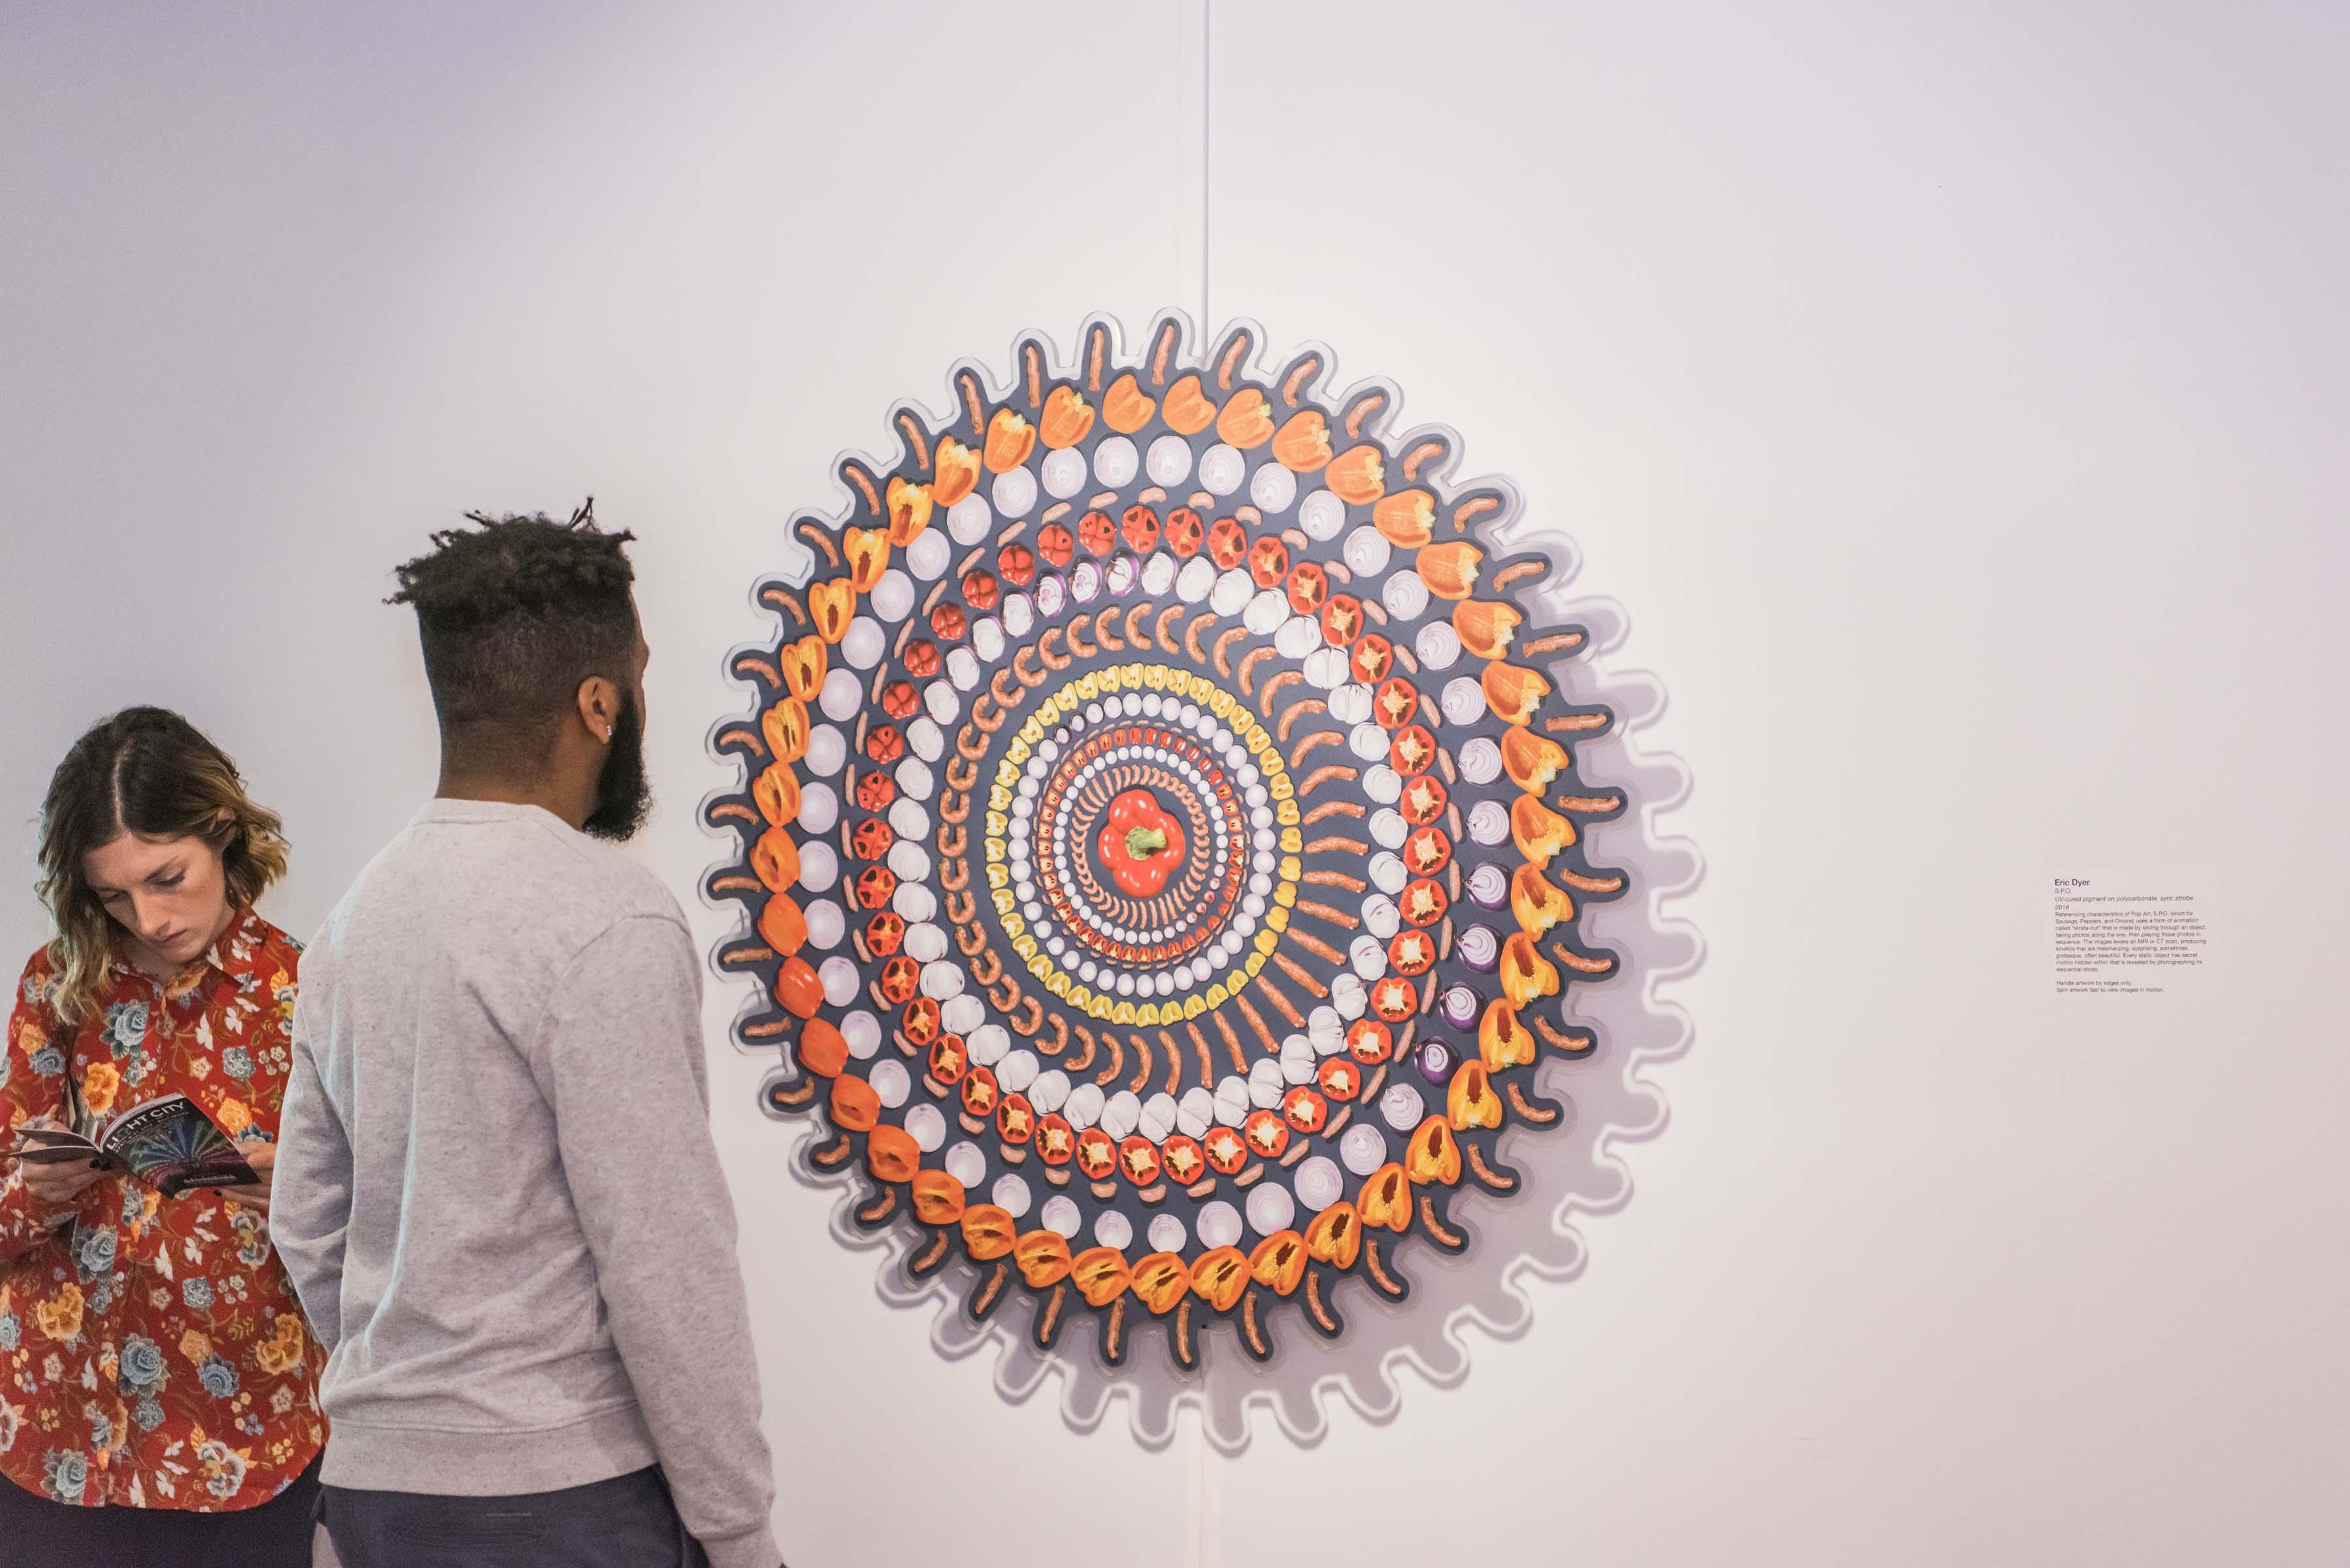 Man looks at art work depicting food